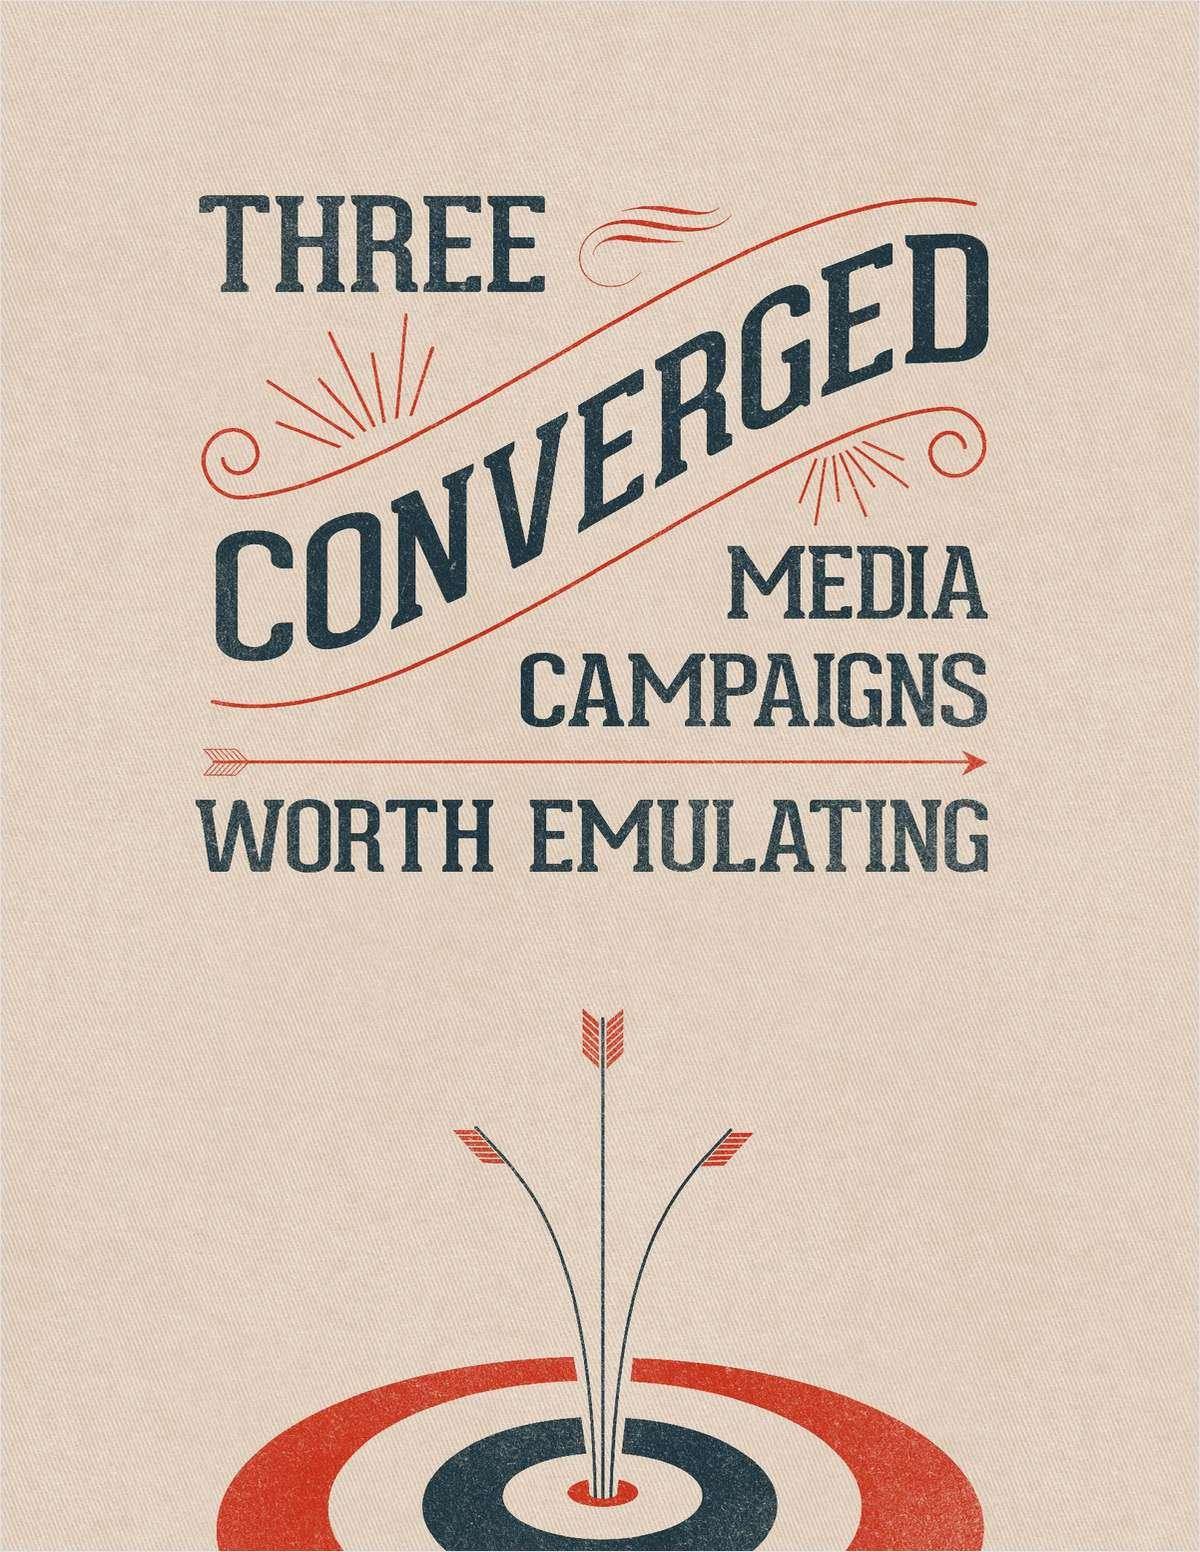 Three Converged Media Campaigns Worth Emulating